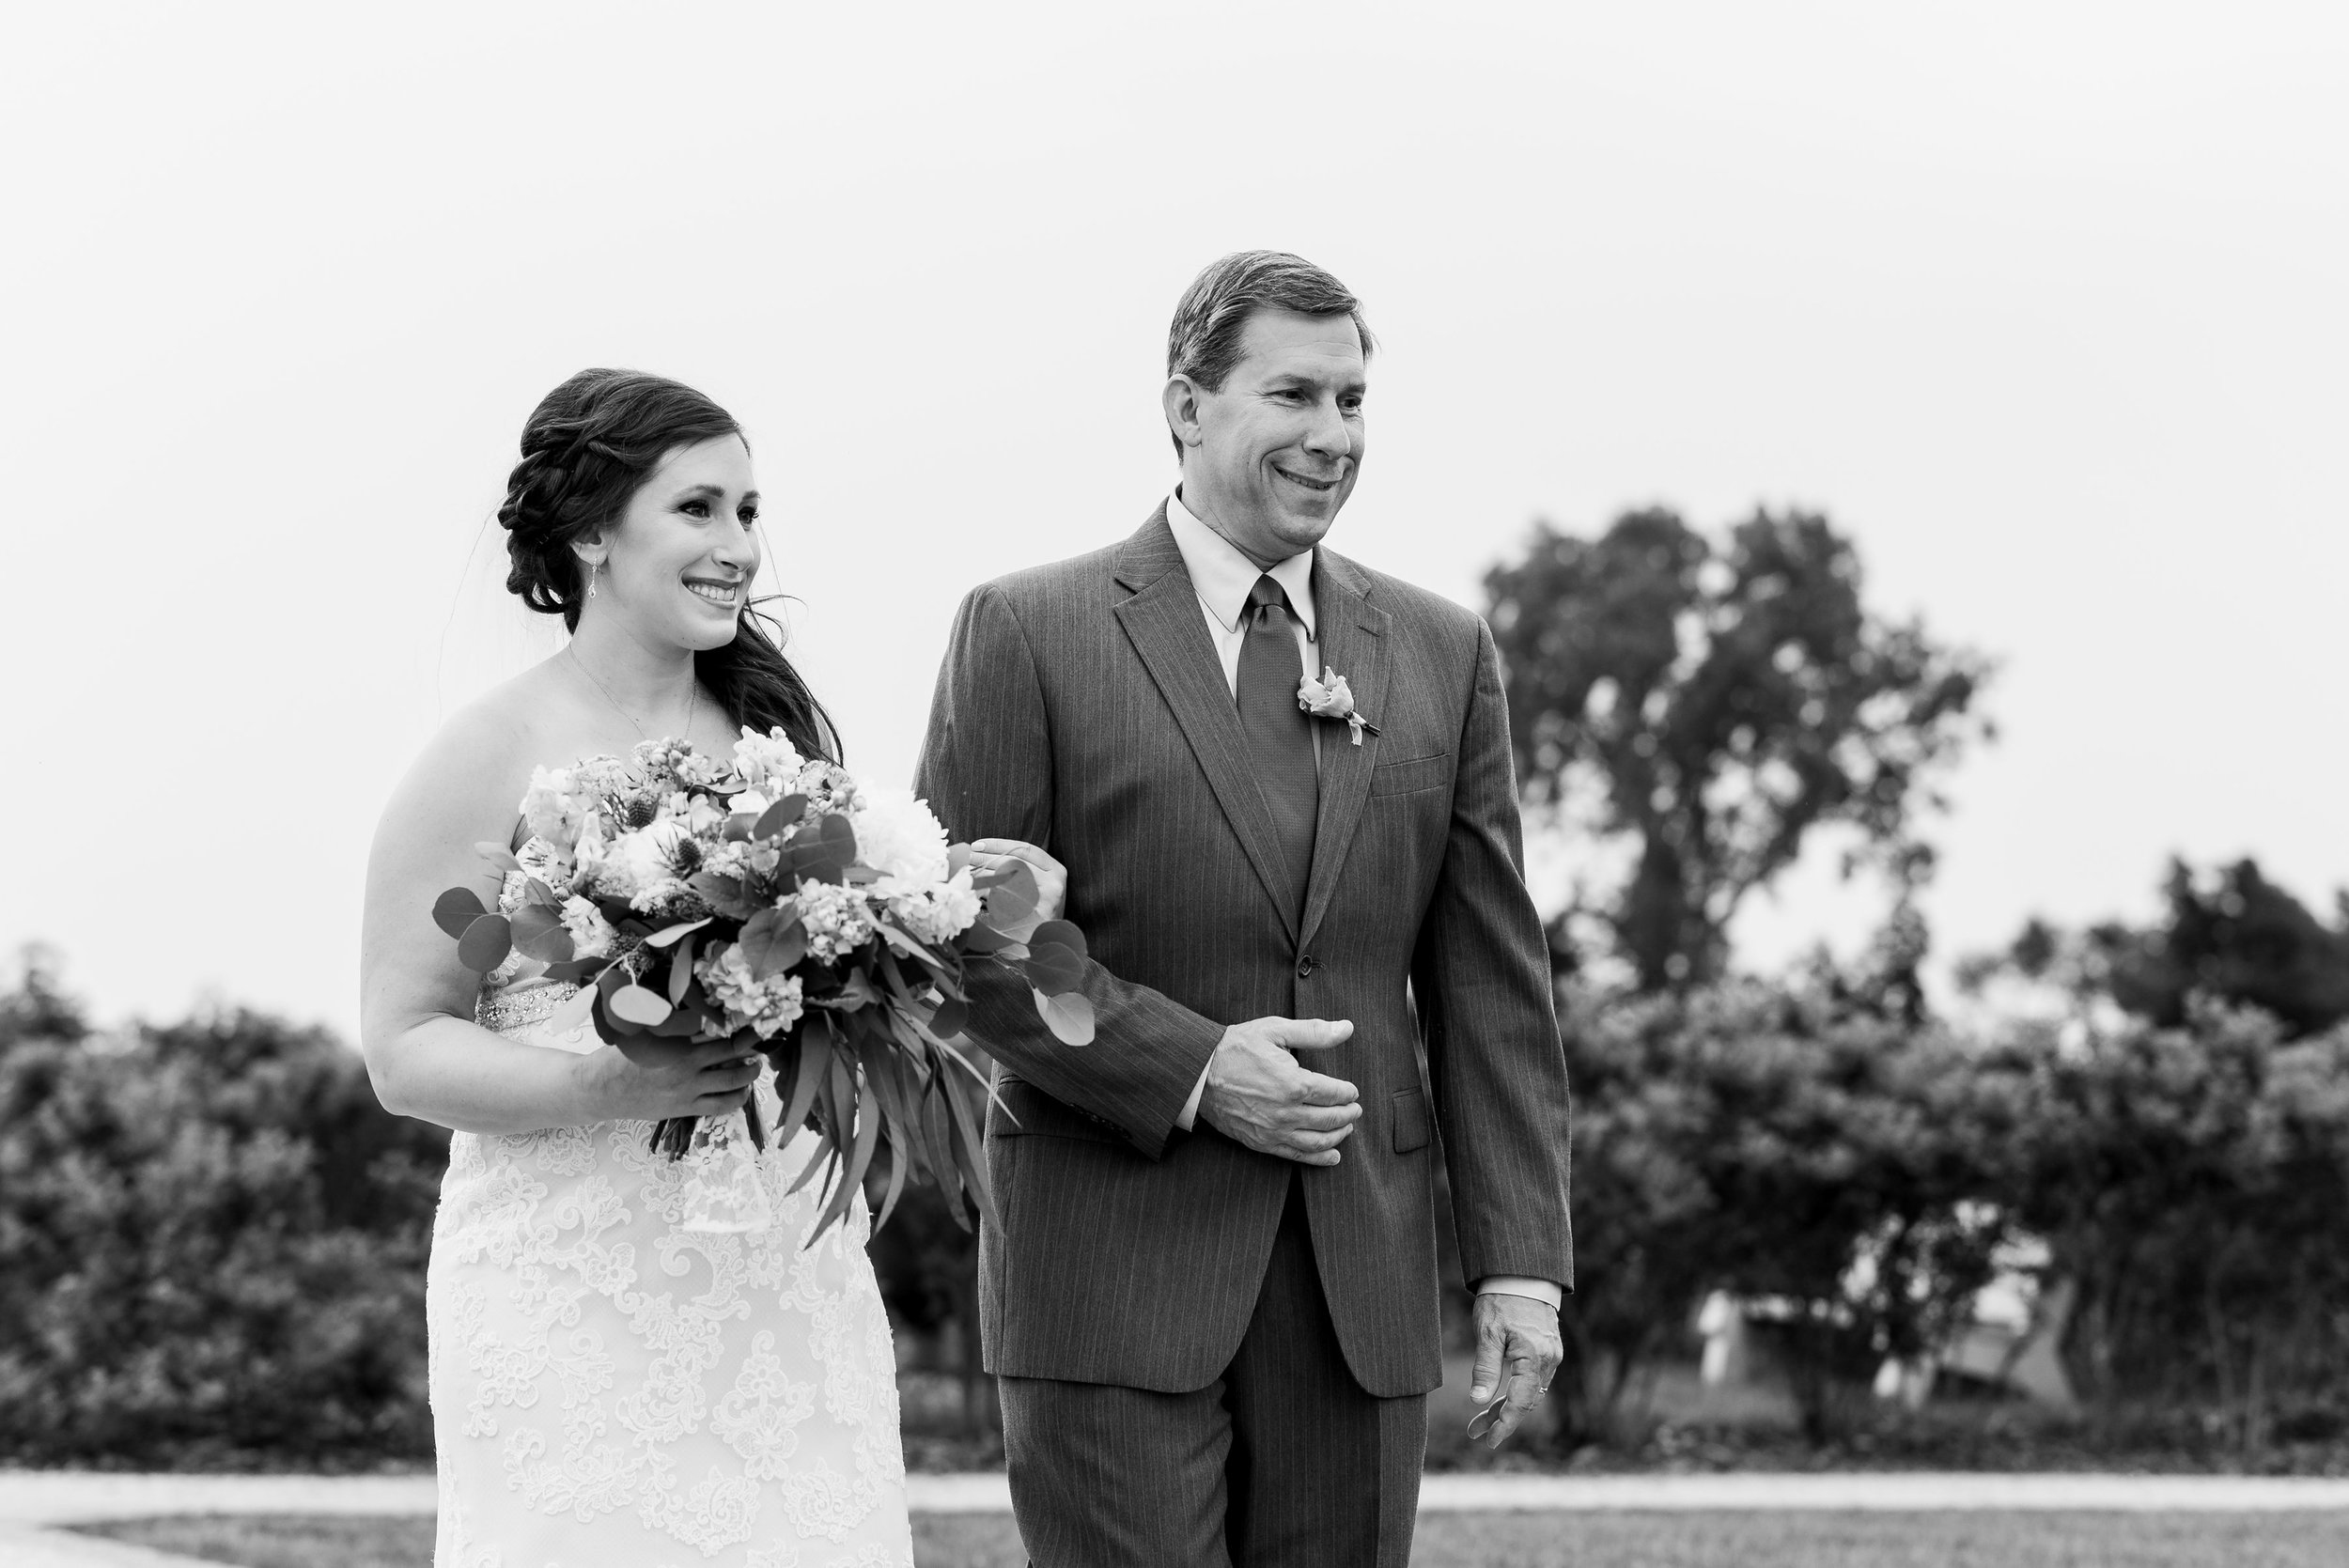 Buchanan House Winery Wedding in Tipton, Iowa